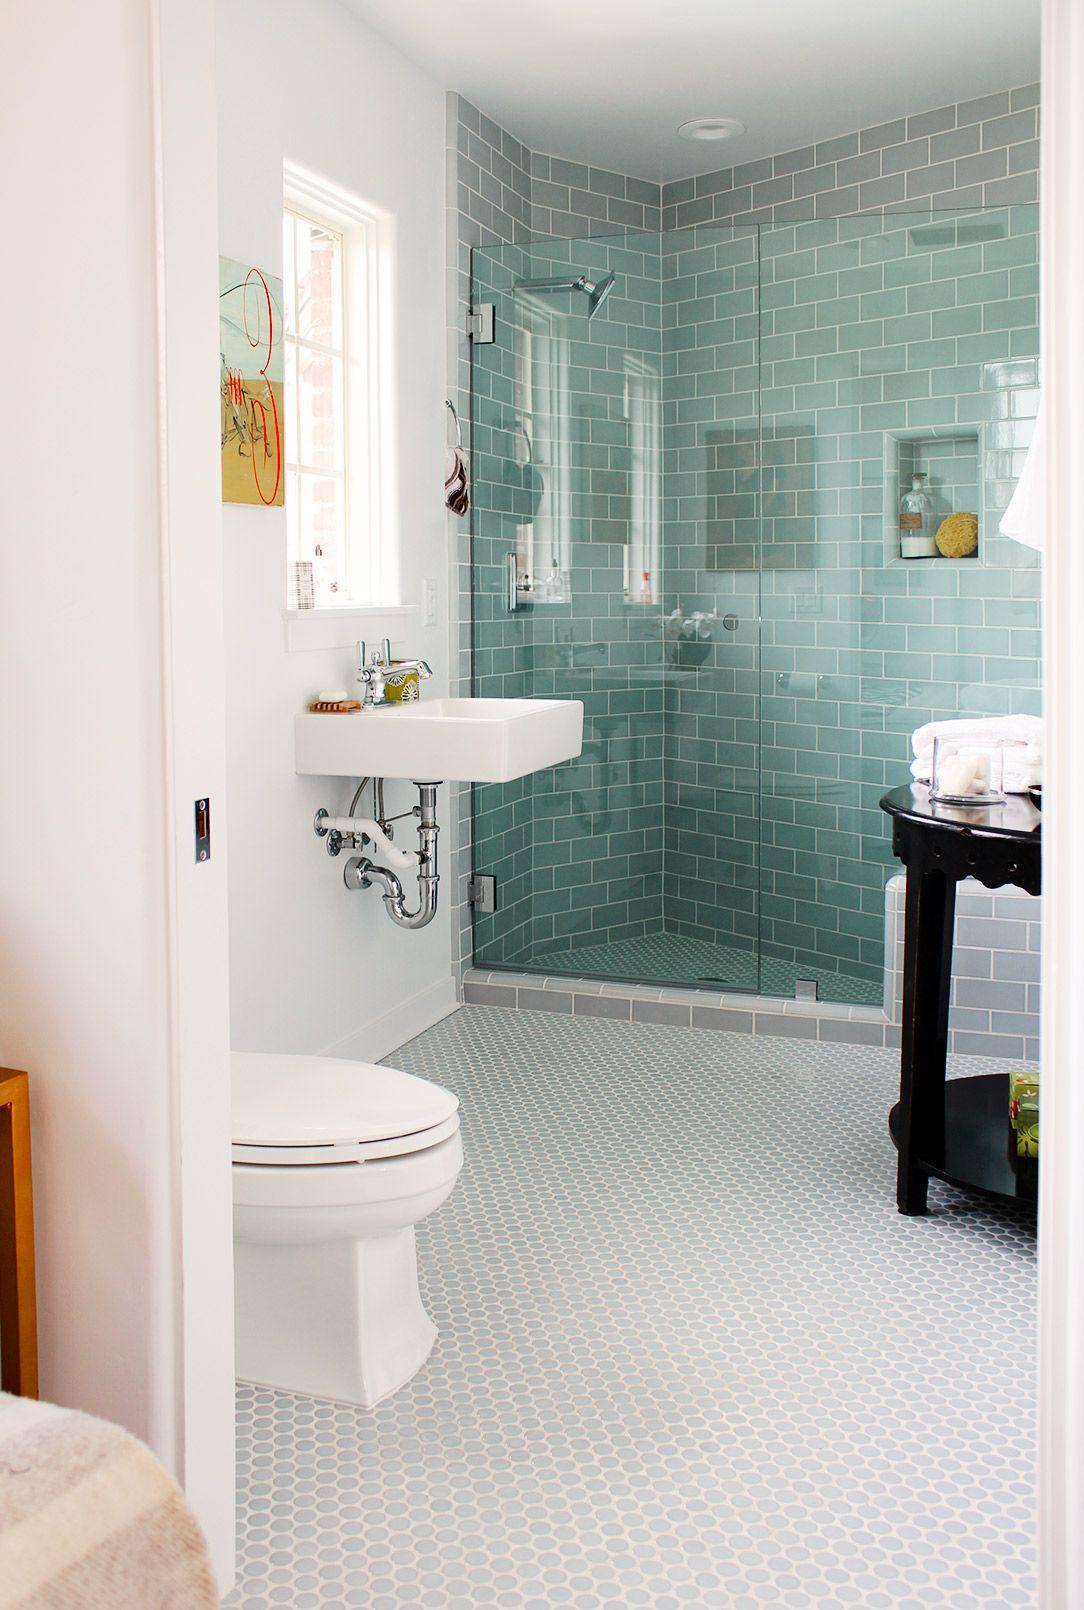 Décor Mistakes To Avoid In Your Bathroom Pinterest Blue Tiles - Bathroom sink drain installation mistakes to avoid